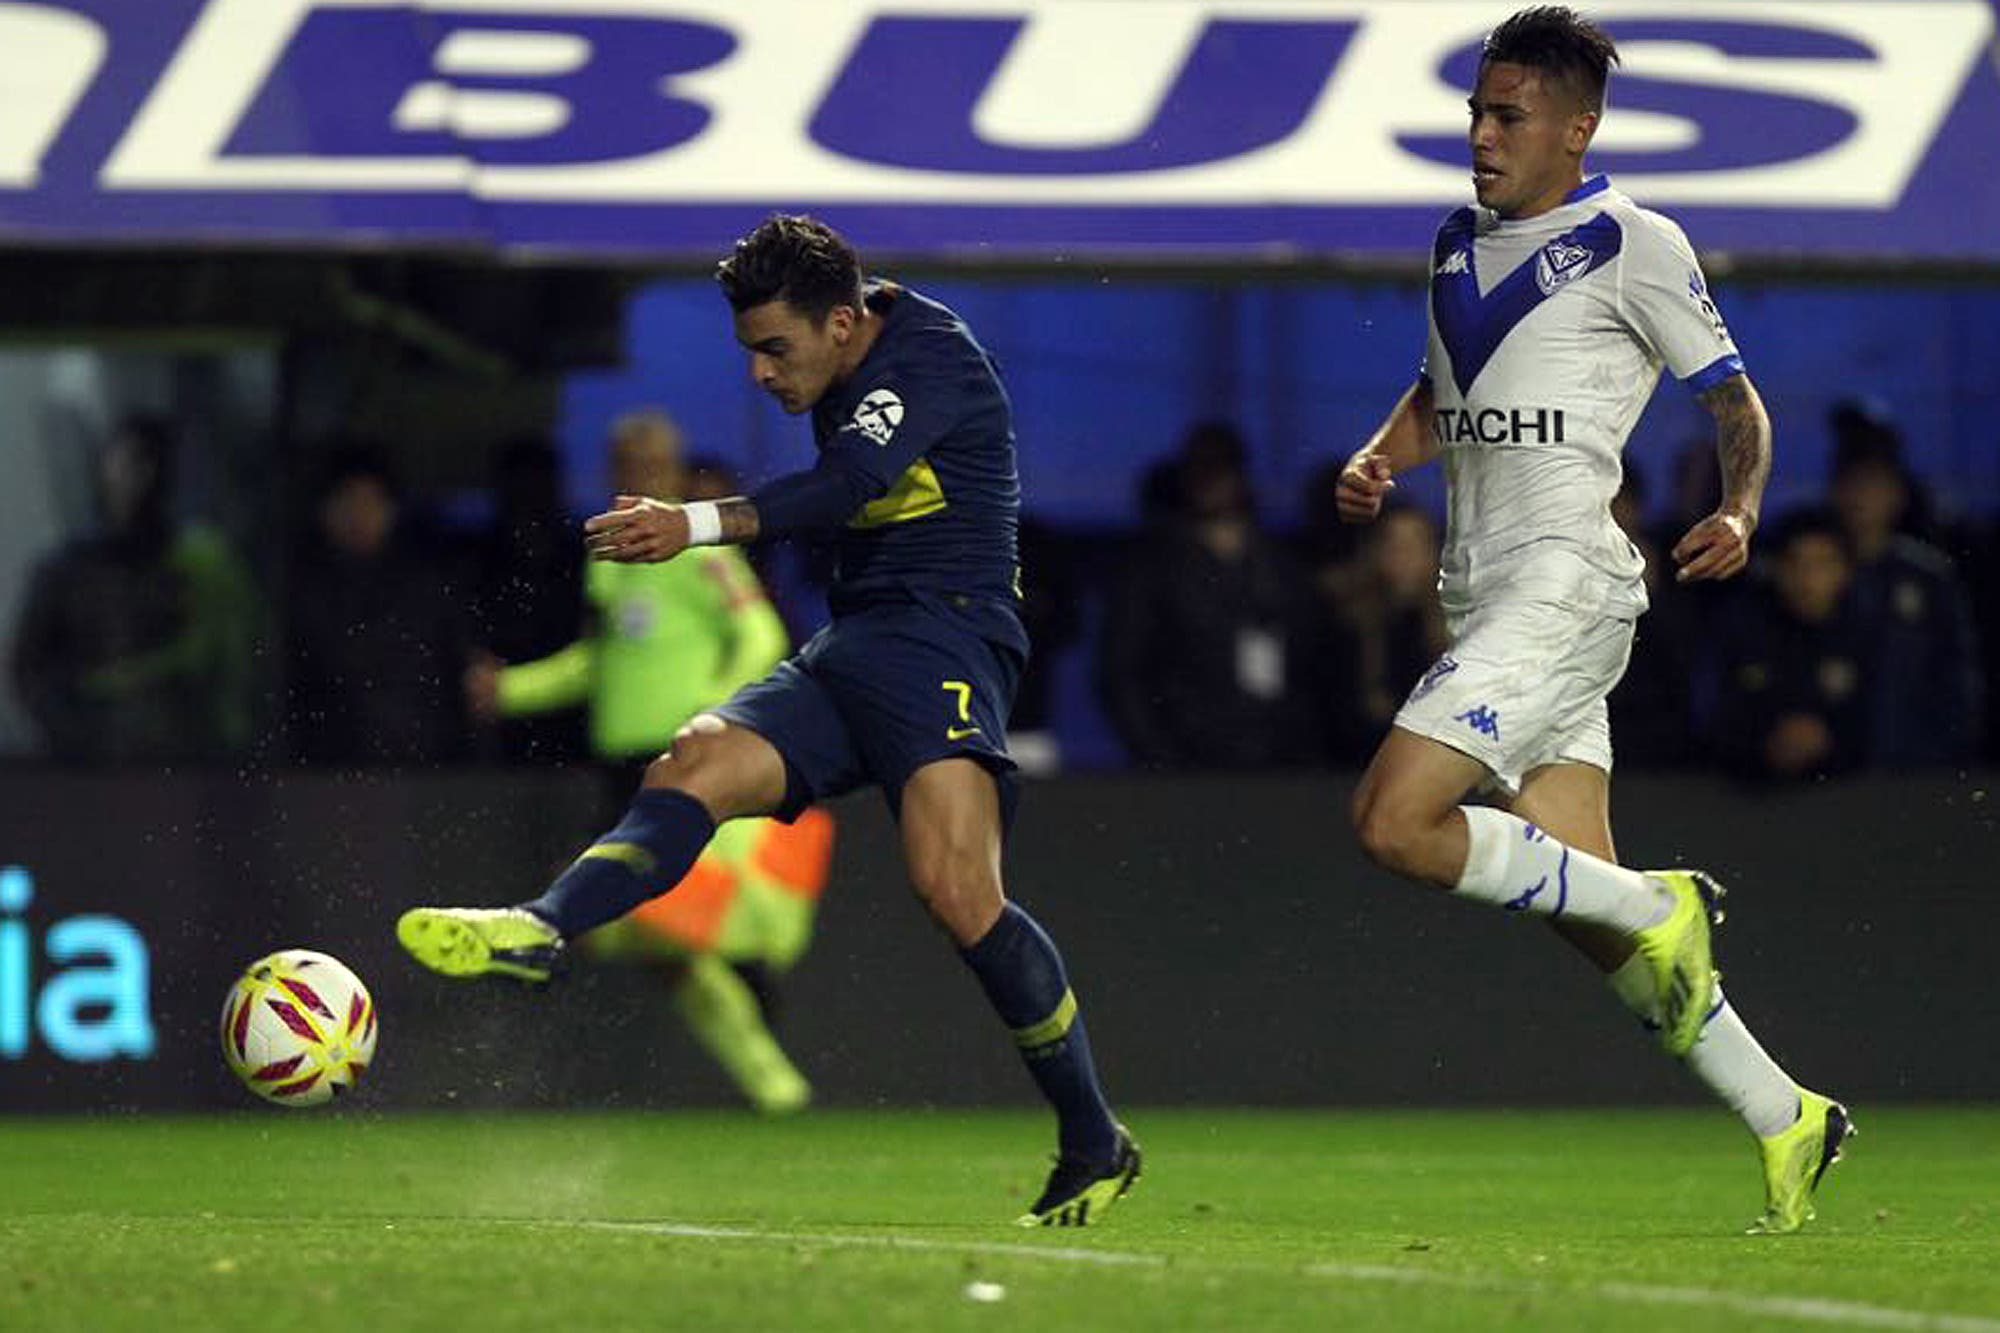 Boca-Vélez, por la Superliga: con gol de Pavón, el xeneize gana 1 a 0 en la Bombonera